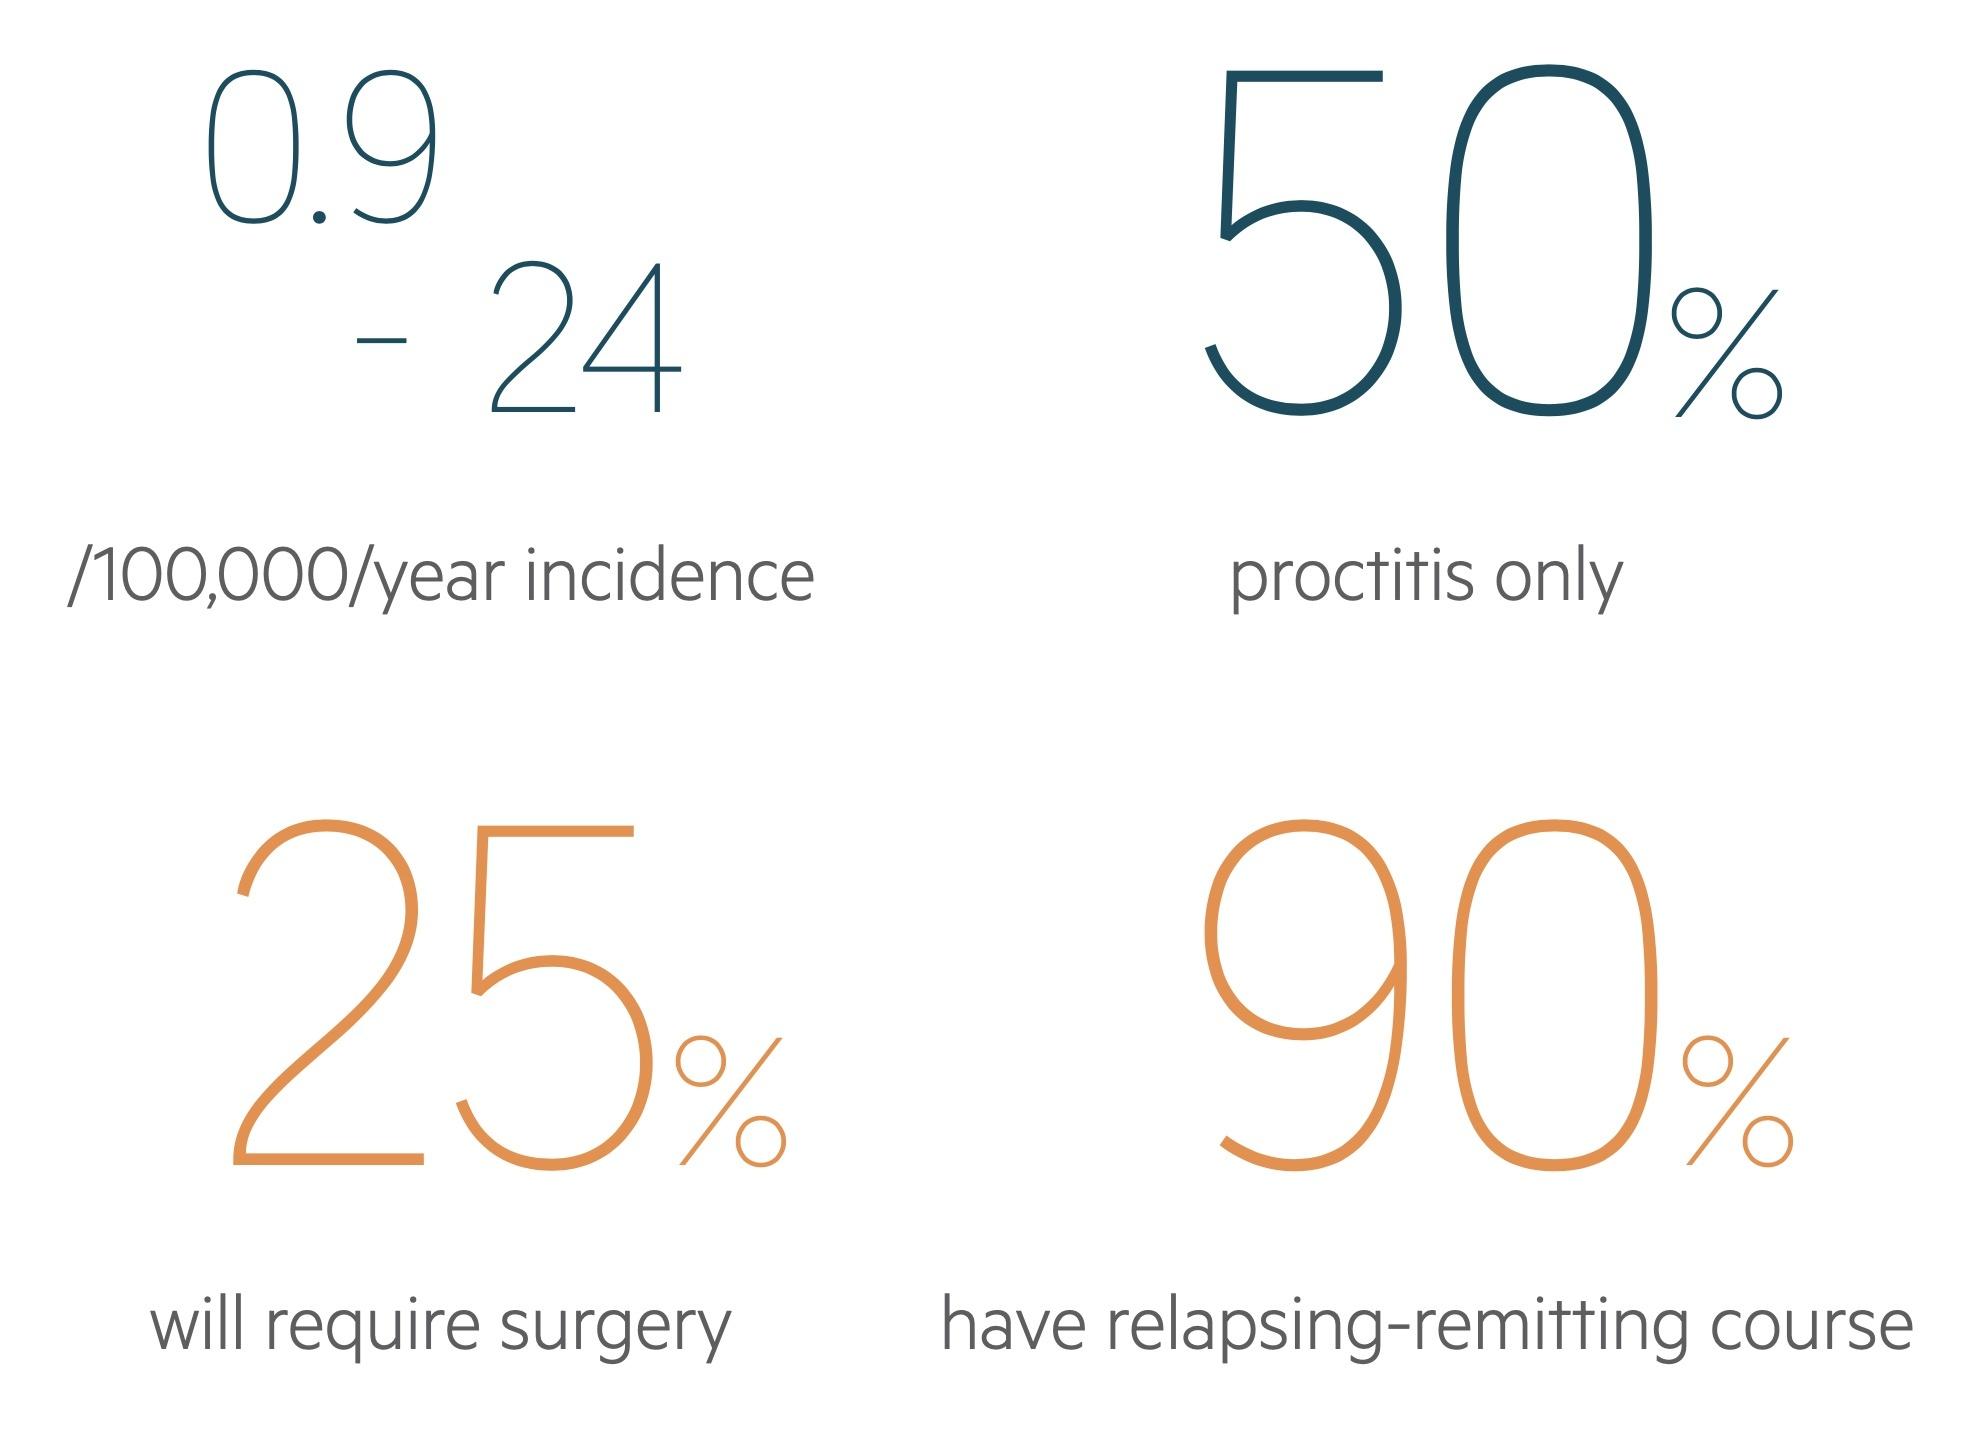 Ulcerative colitis statistics